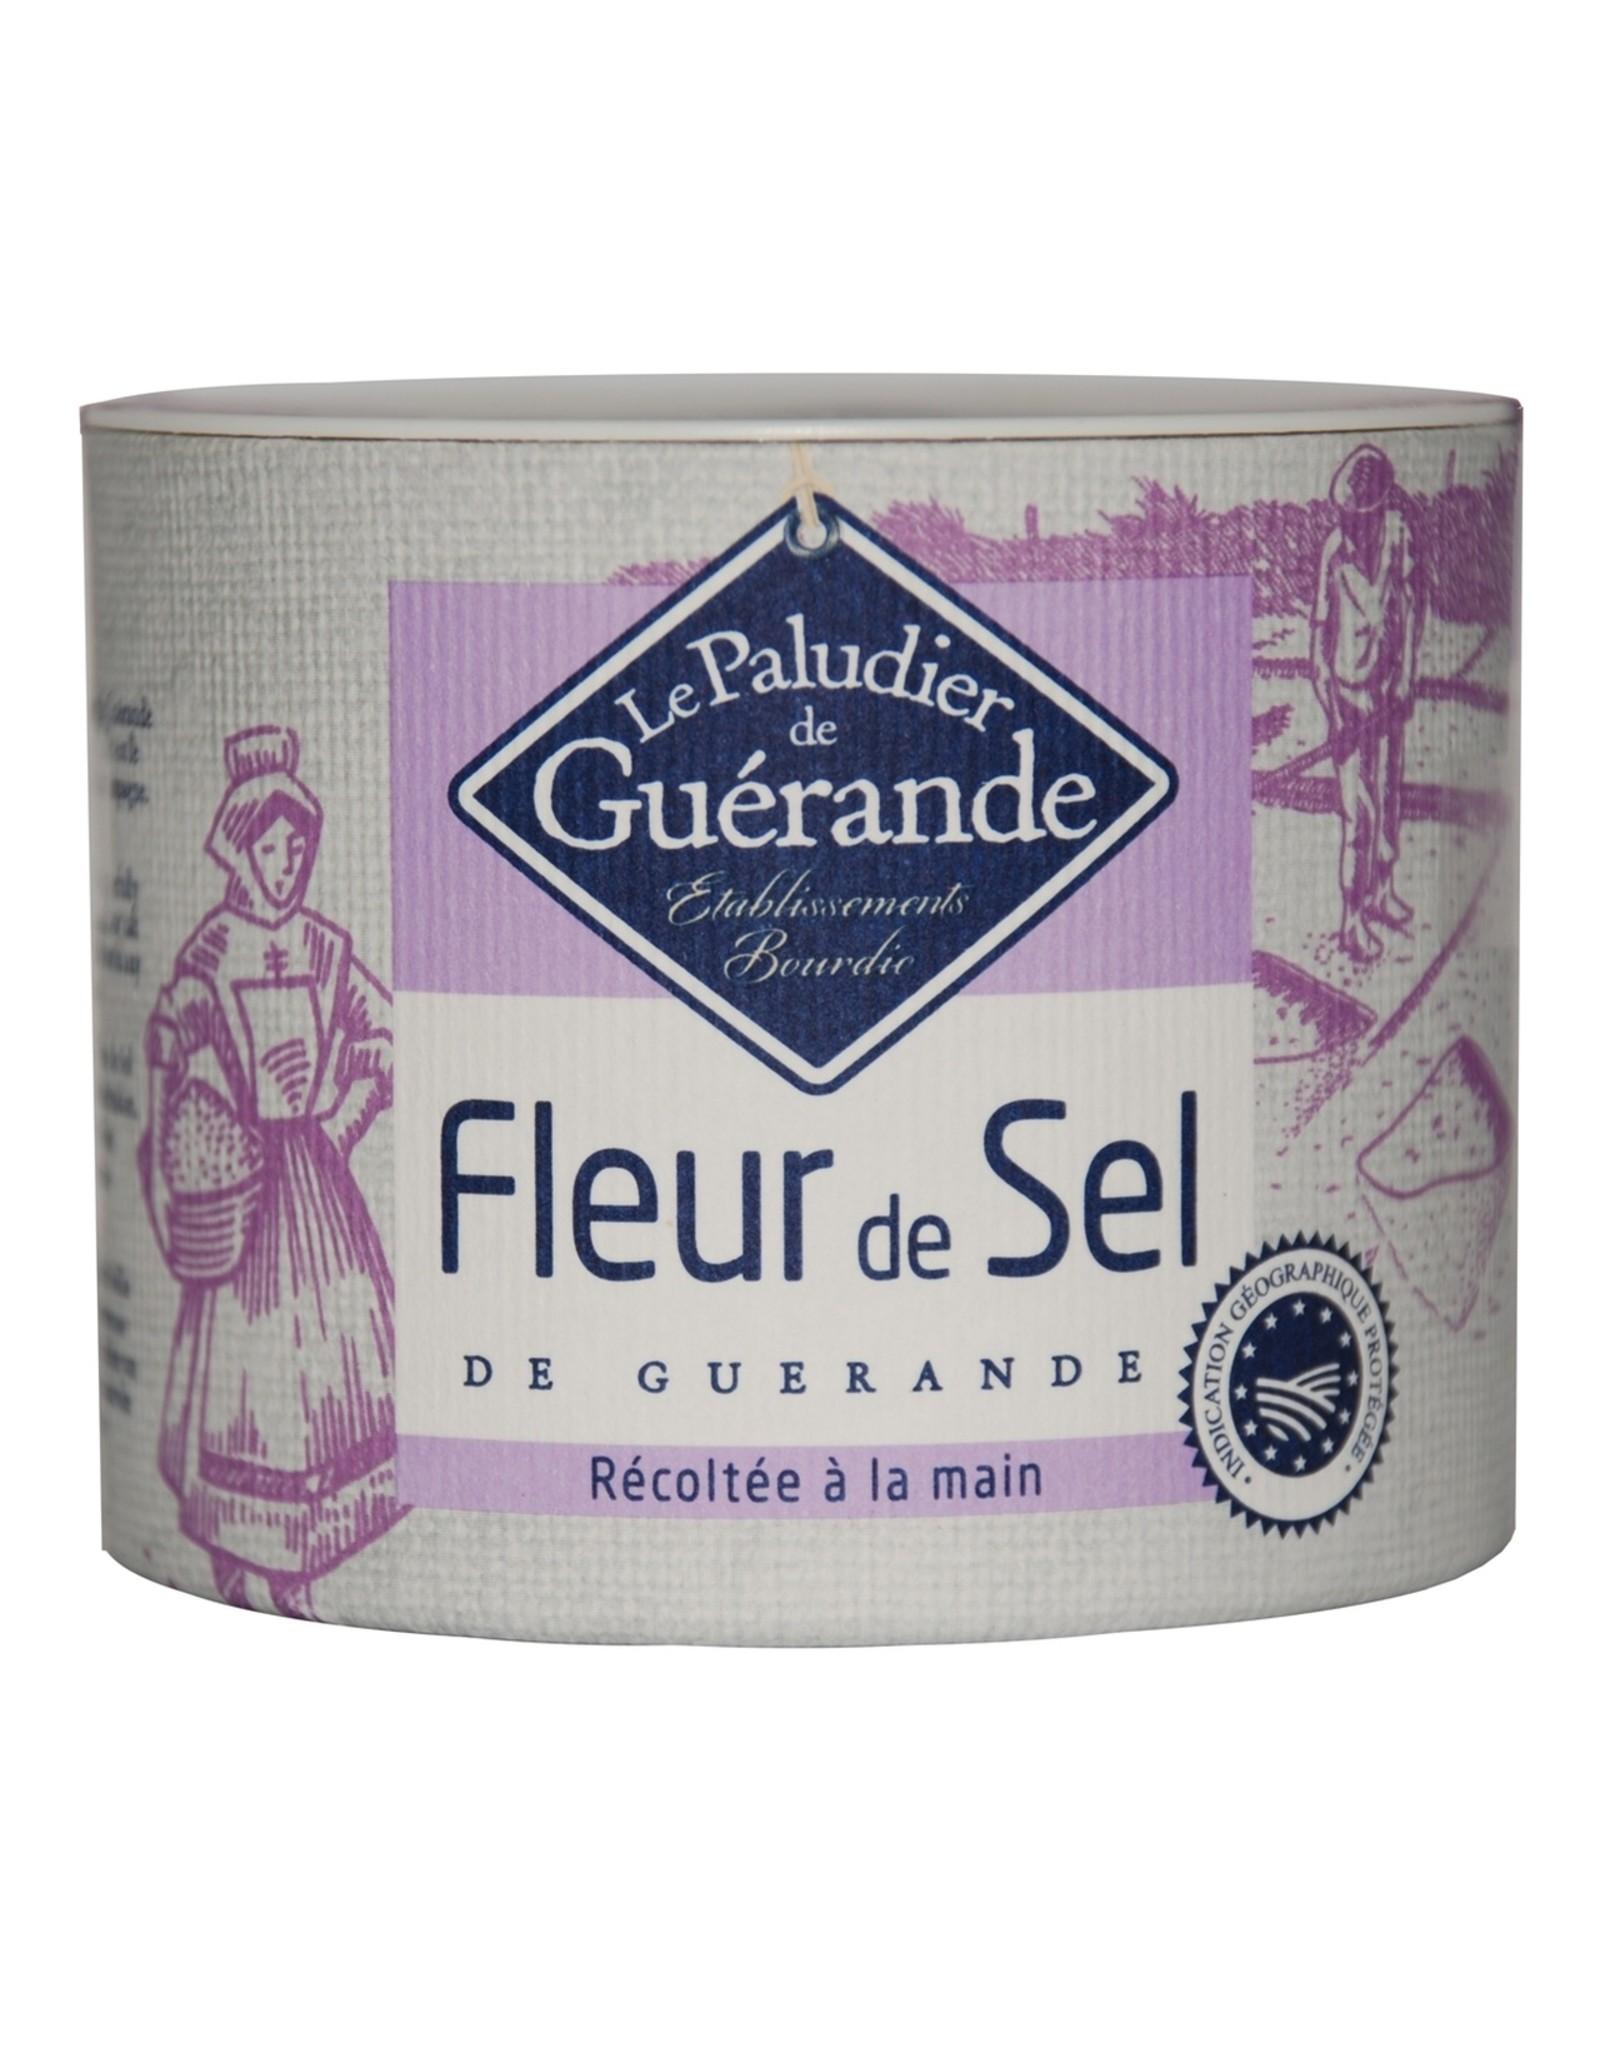 Le Paludier de Guérande Le Paludier de Guérande Fleur de Sel Salt 4.4oz